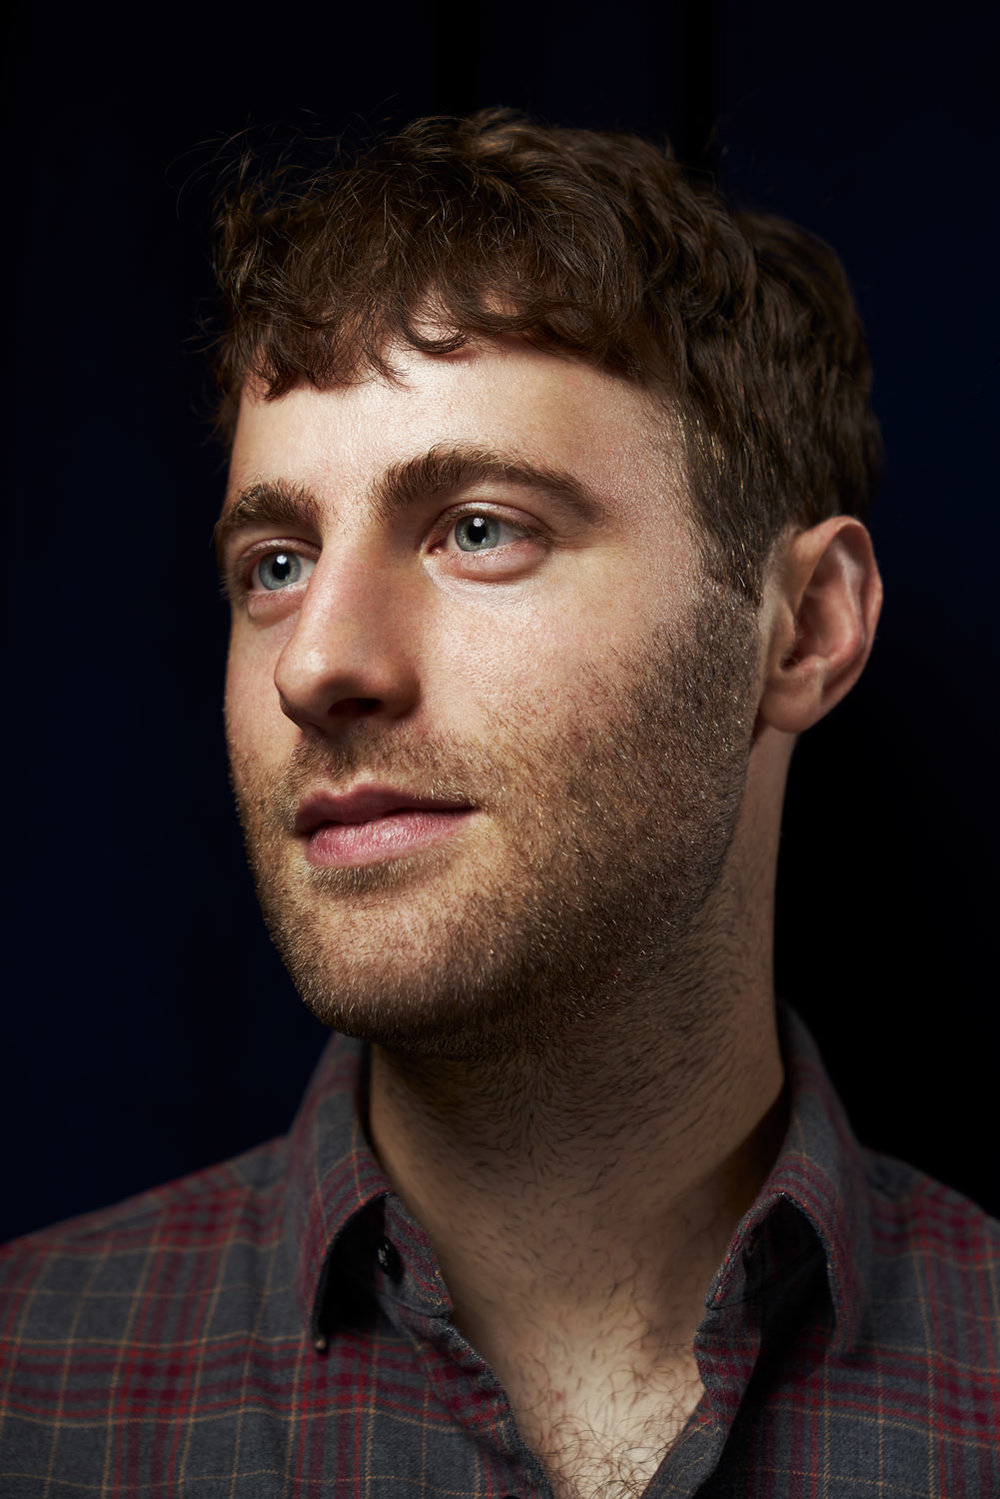 Alex Levine